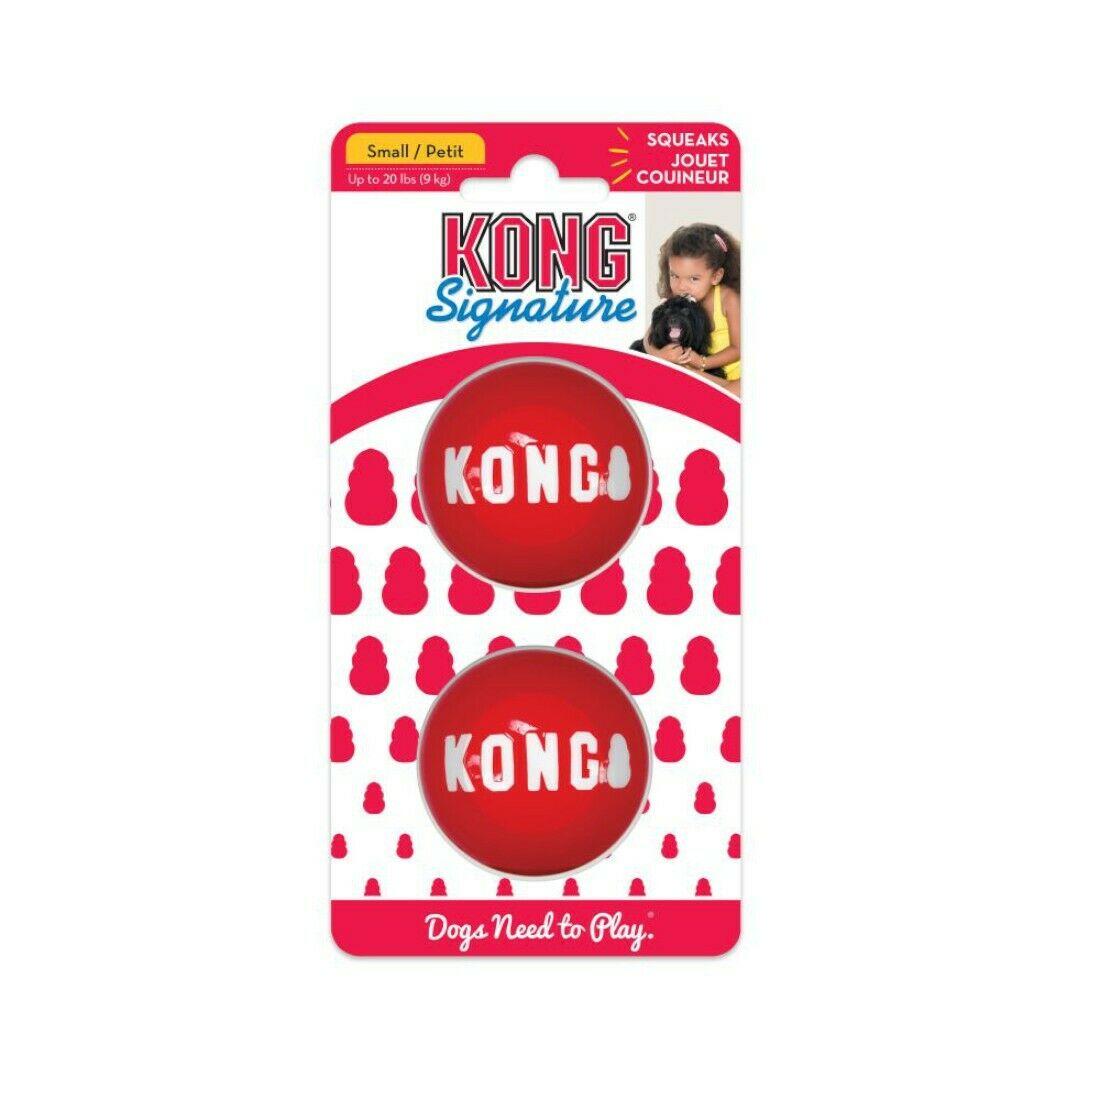 KONG Signature Ball Dog Toy, 2-pack Image